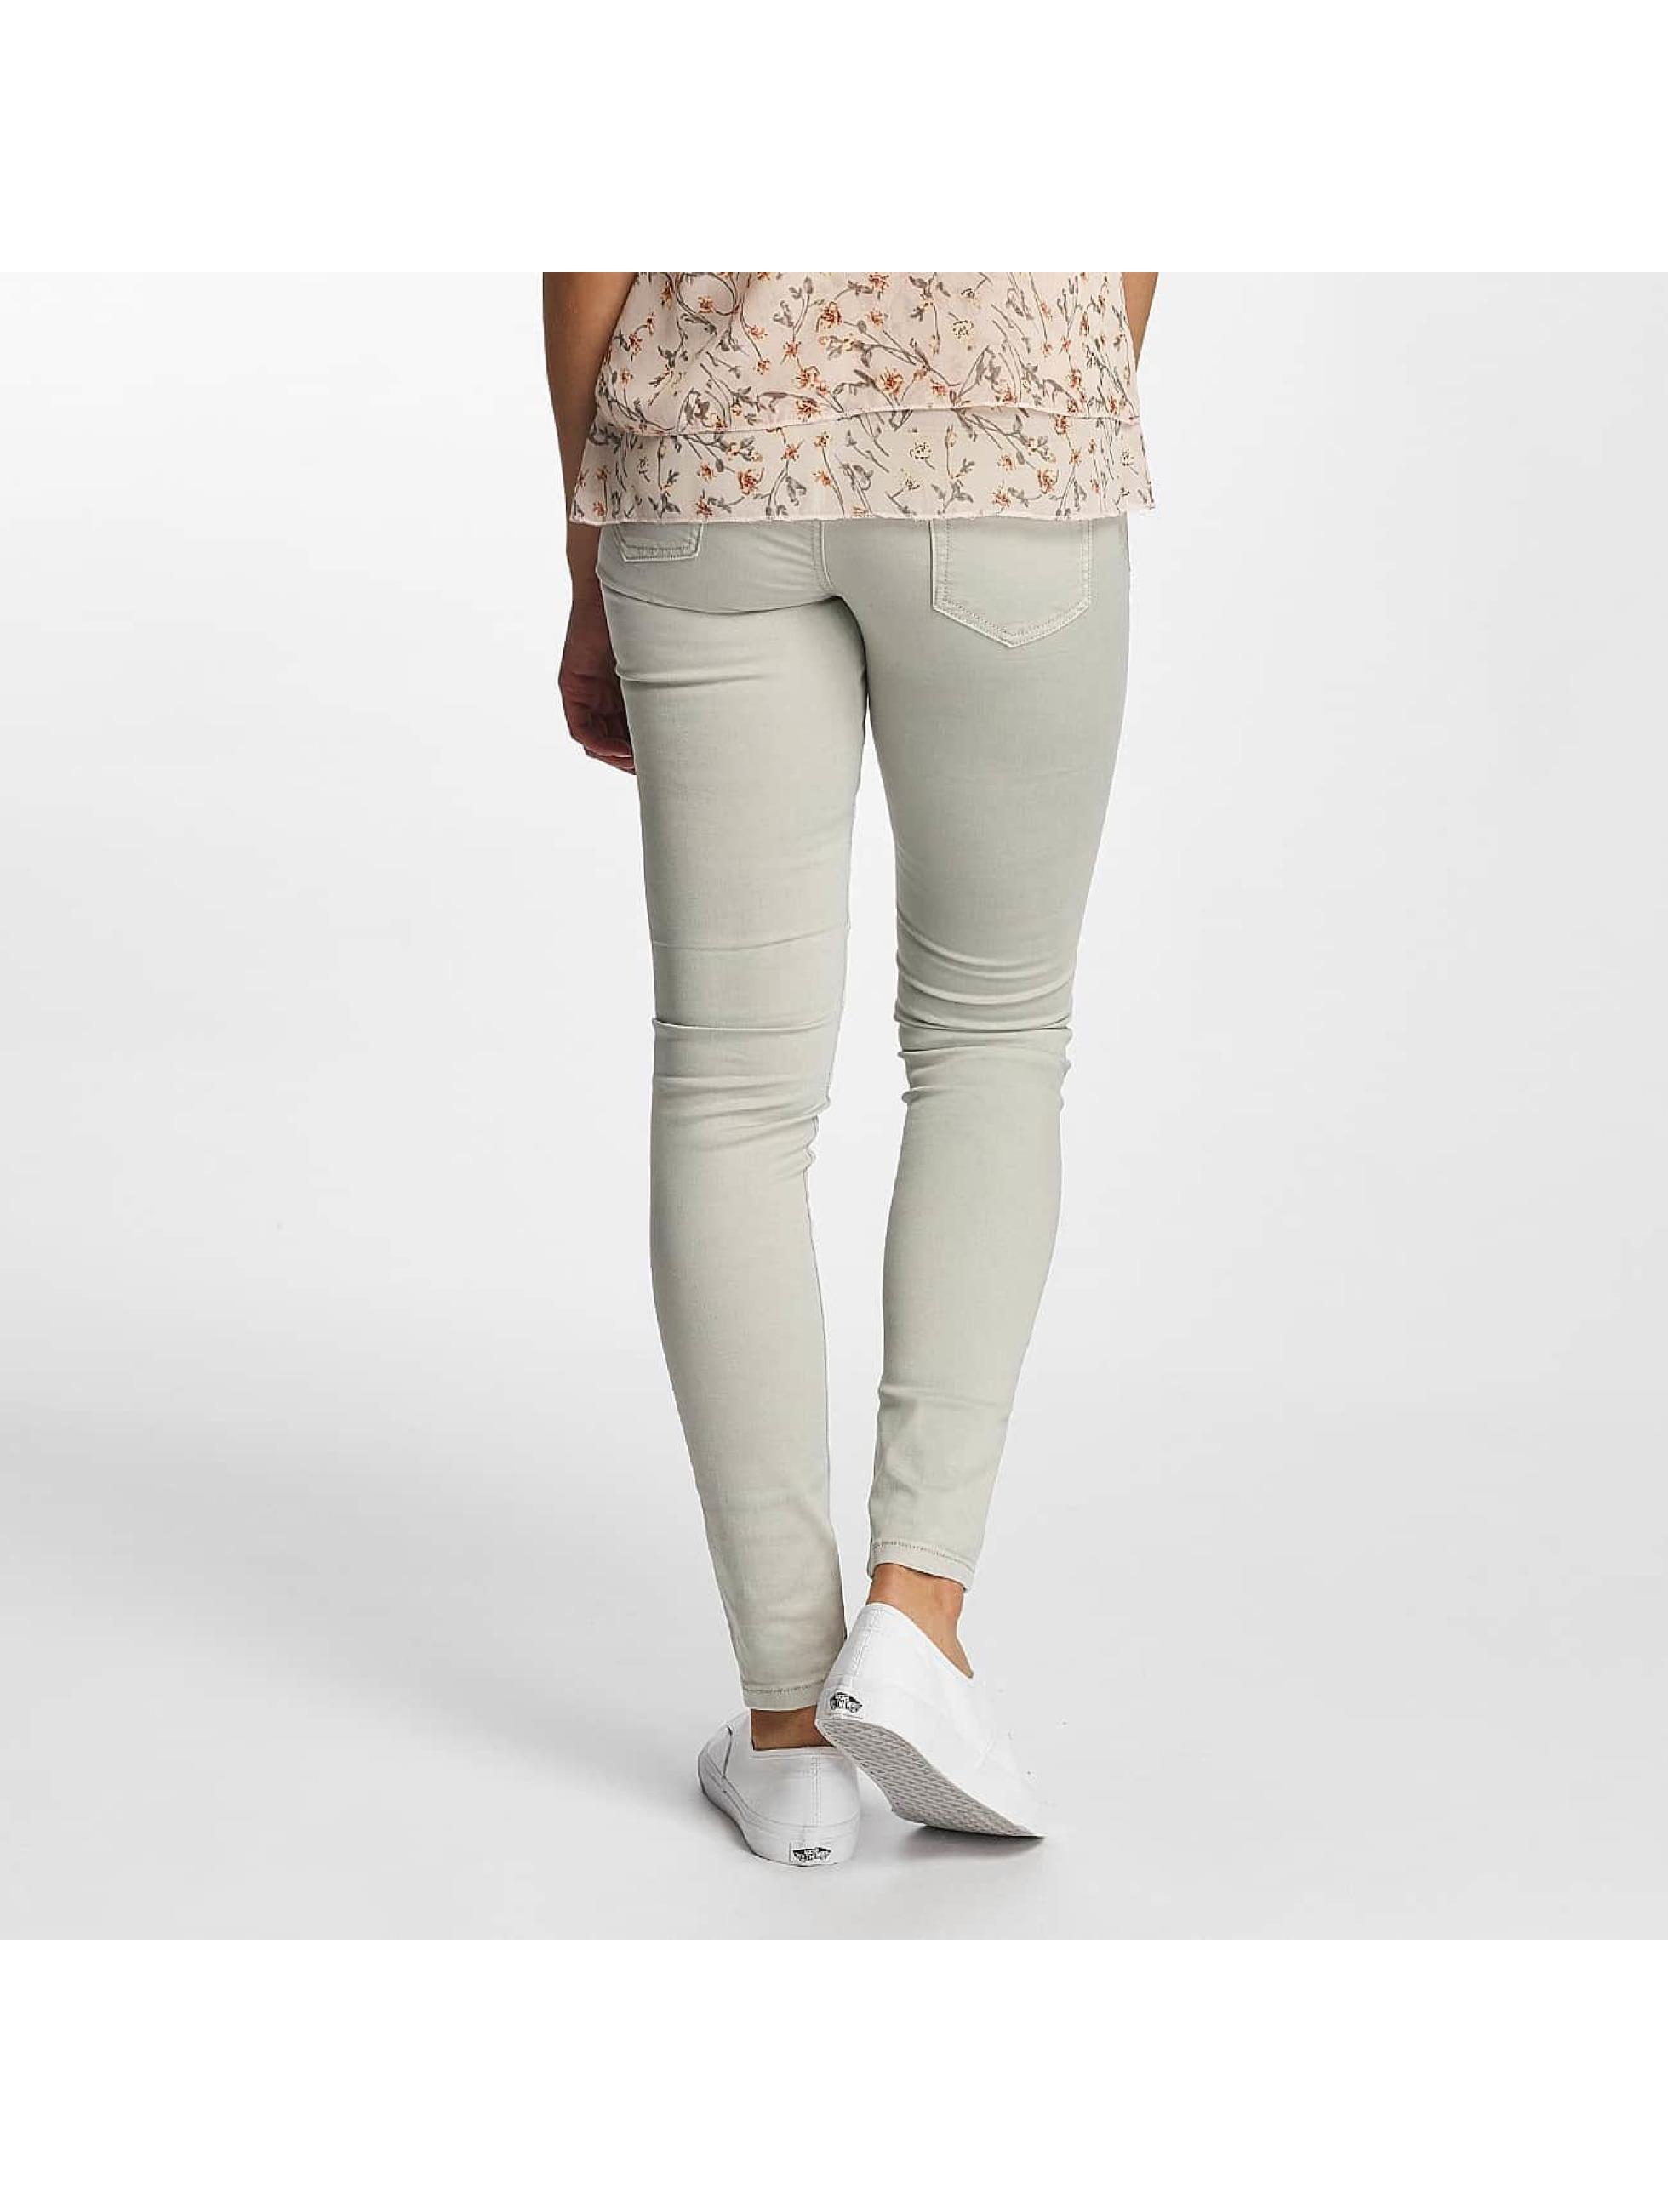 Hailys Skinny Jeans Kina Biker grau